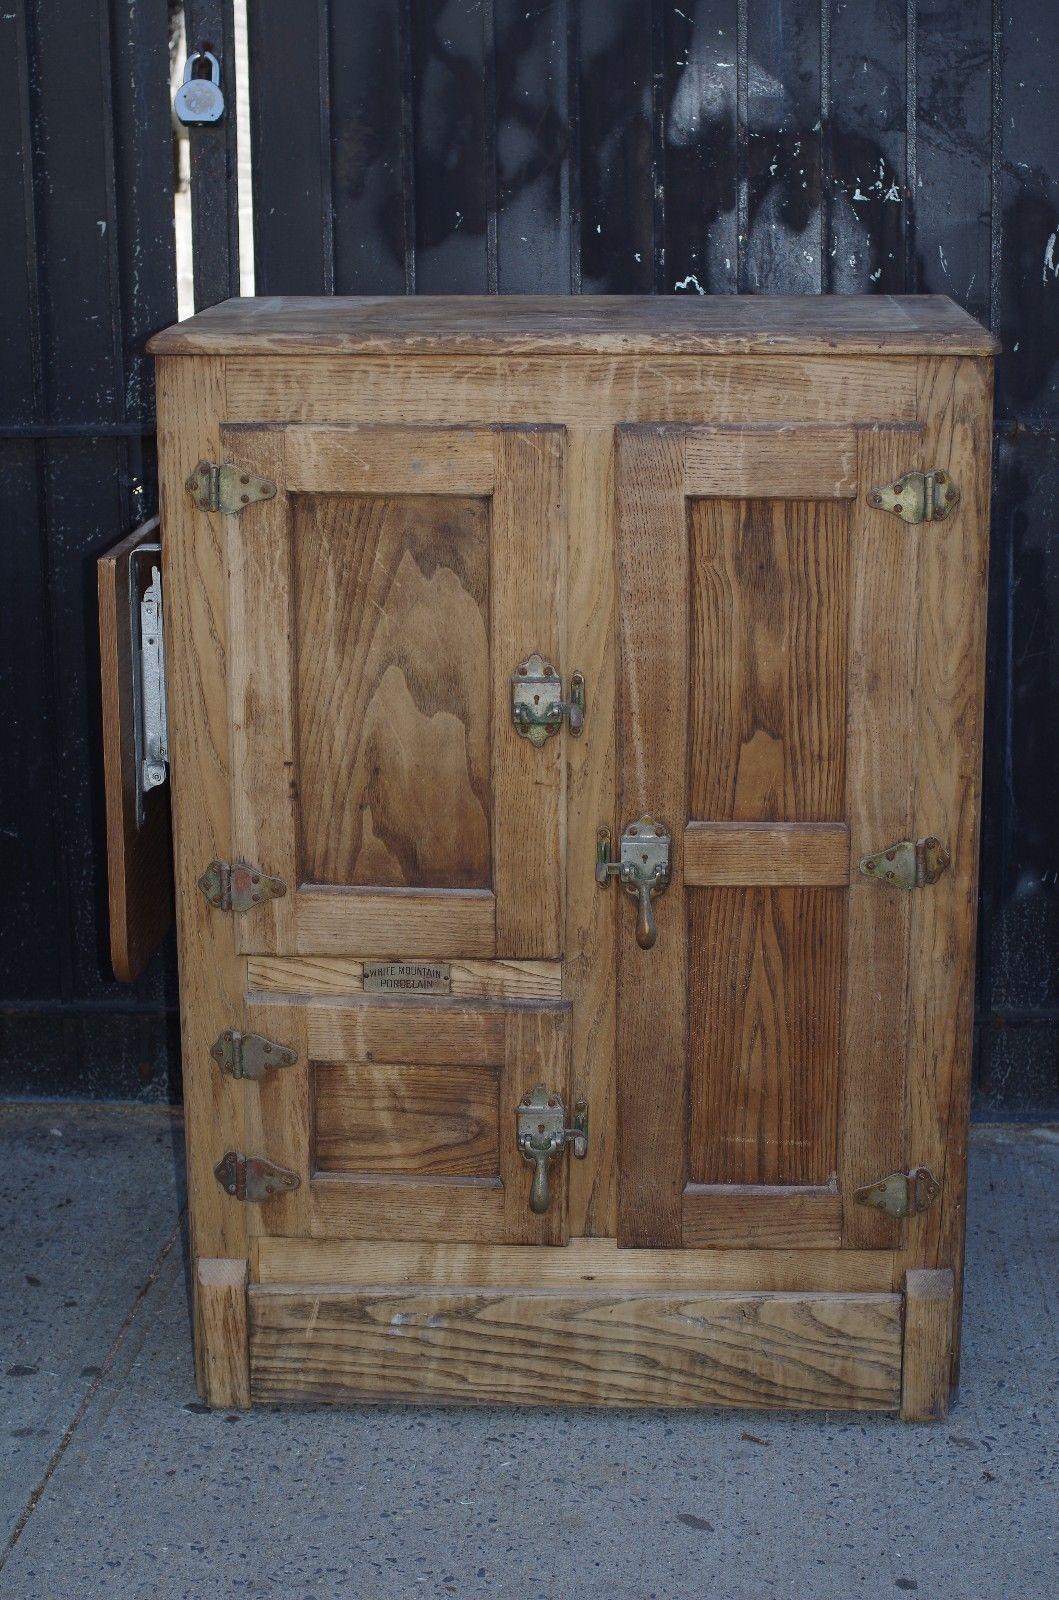 Antique White Mountain Porcelain Refrigerator Solid Oak Wood Ice Box Cabinet   eBay